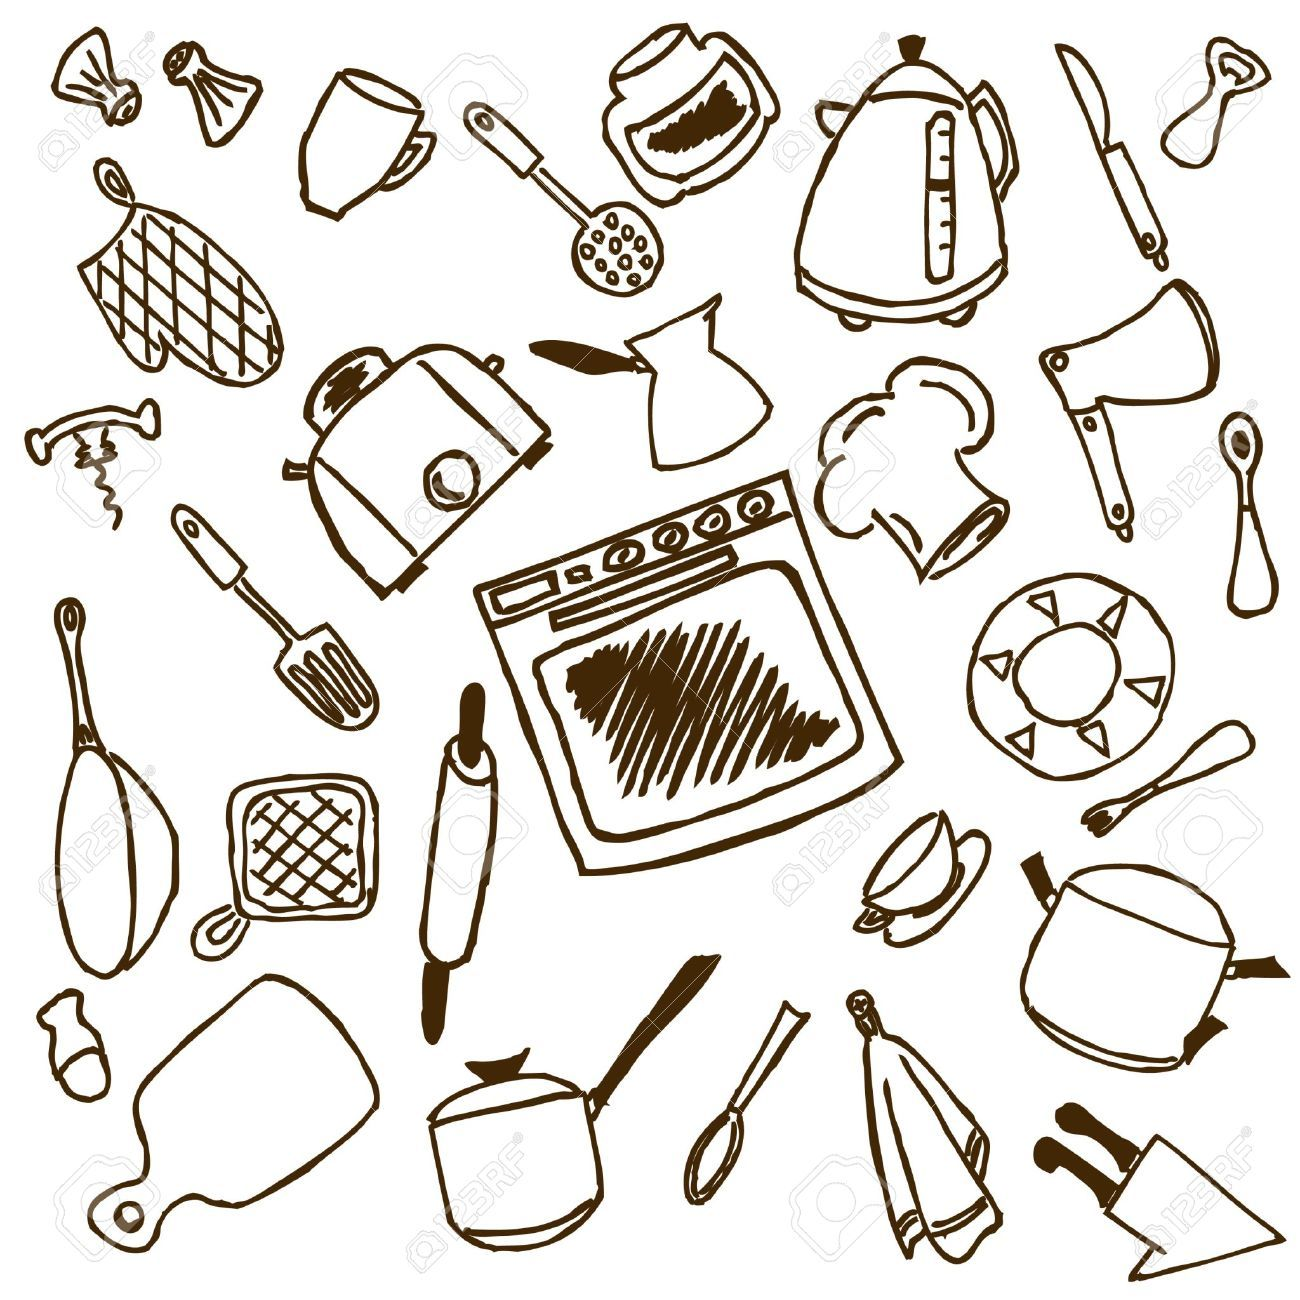 Risultati immagini per utensili cucina disegni utensili for Utensili per cucina professionale